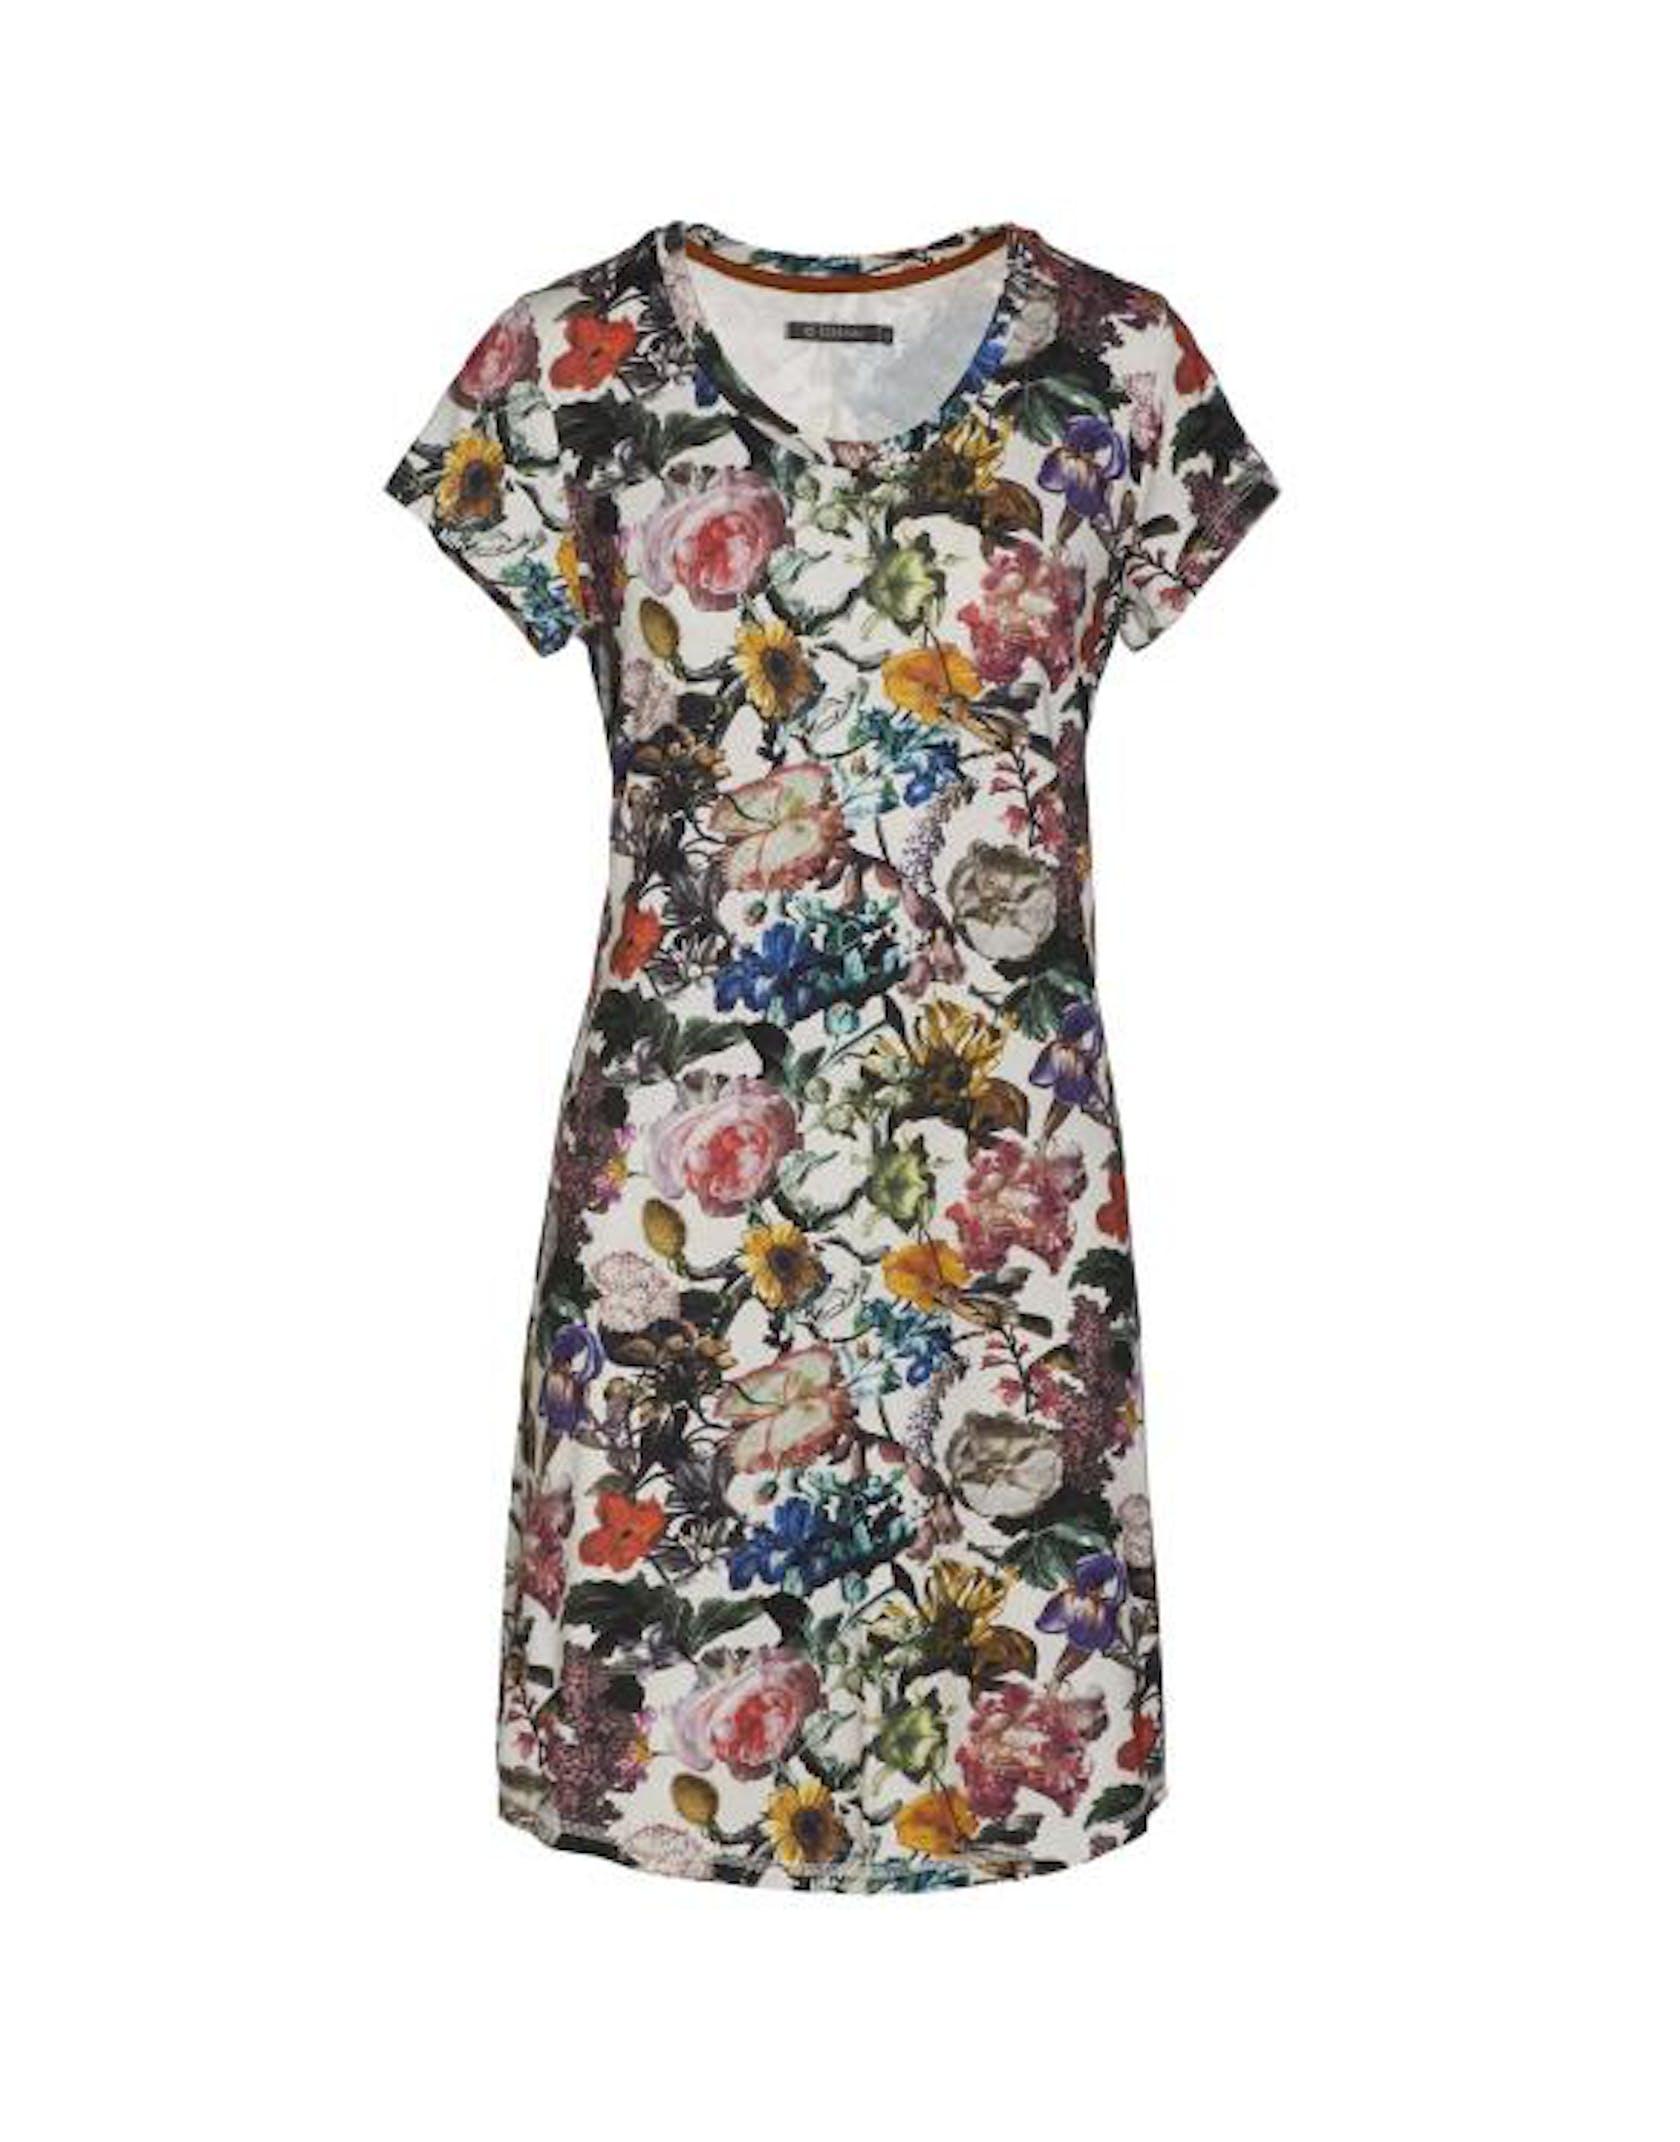 ESSENZA Isa Famke Vanilla Nightdress short sleeve M